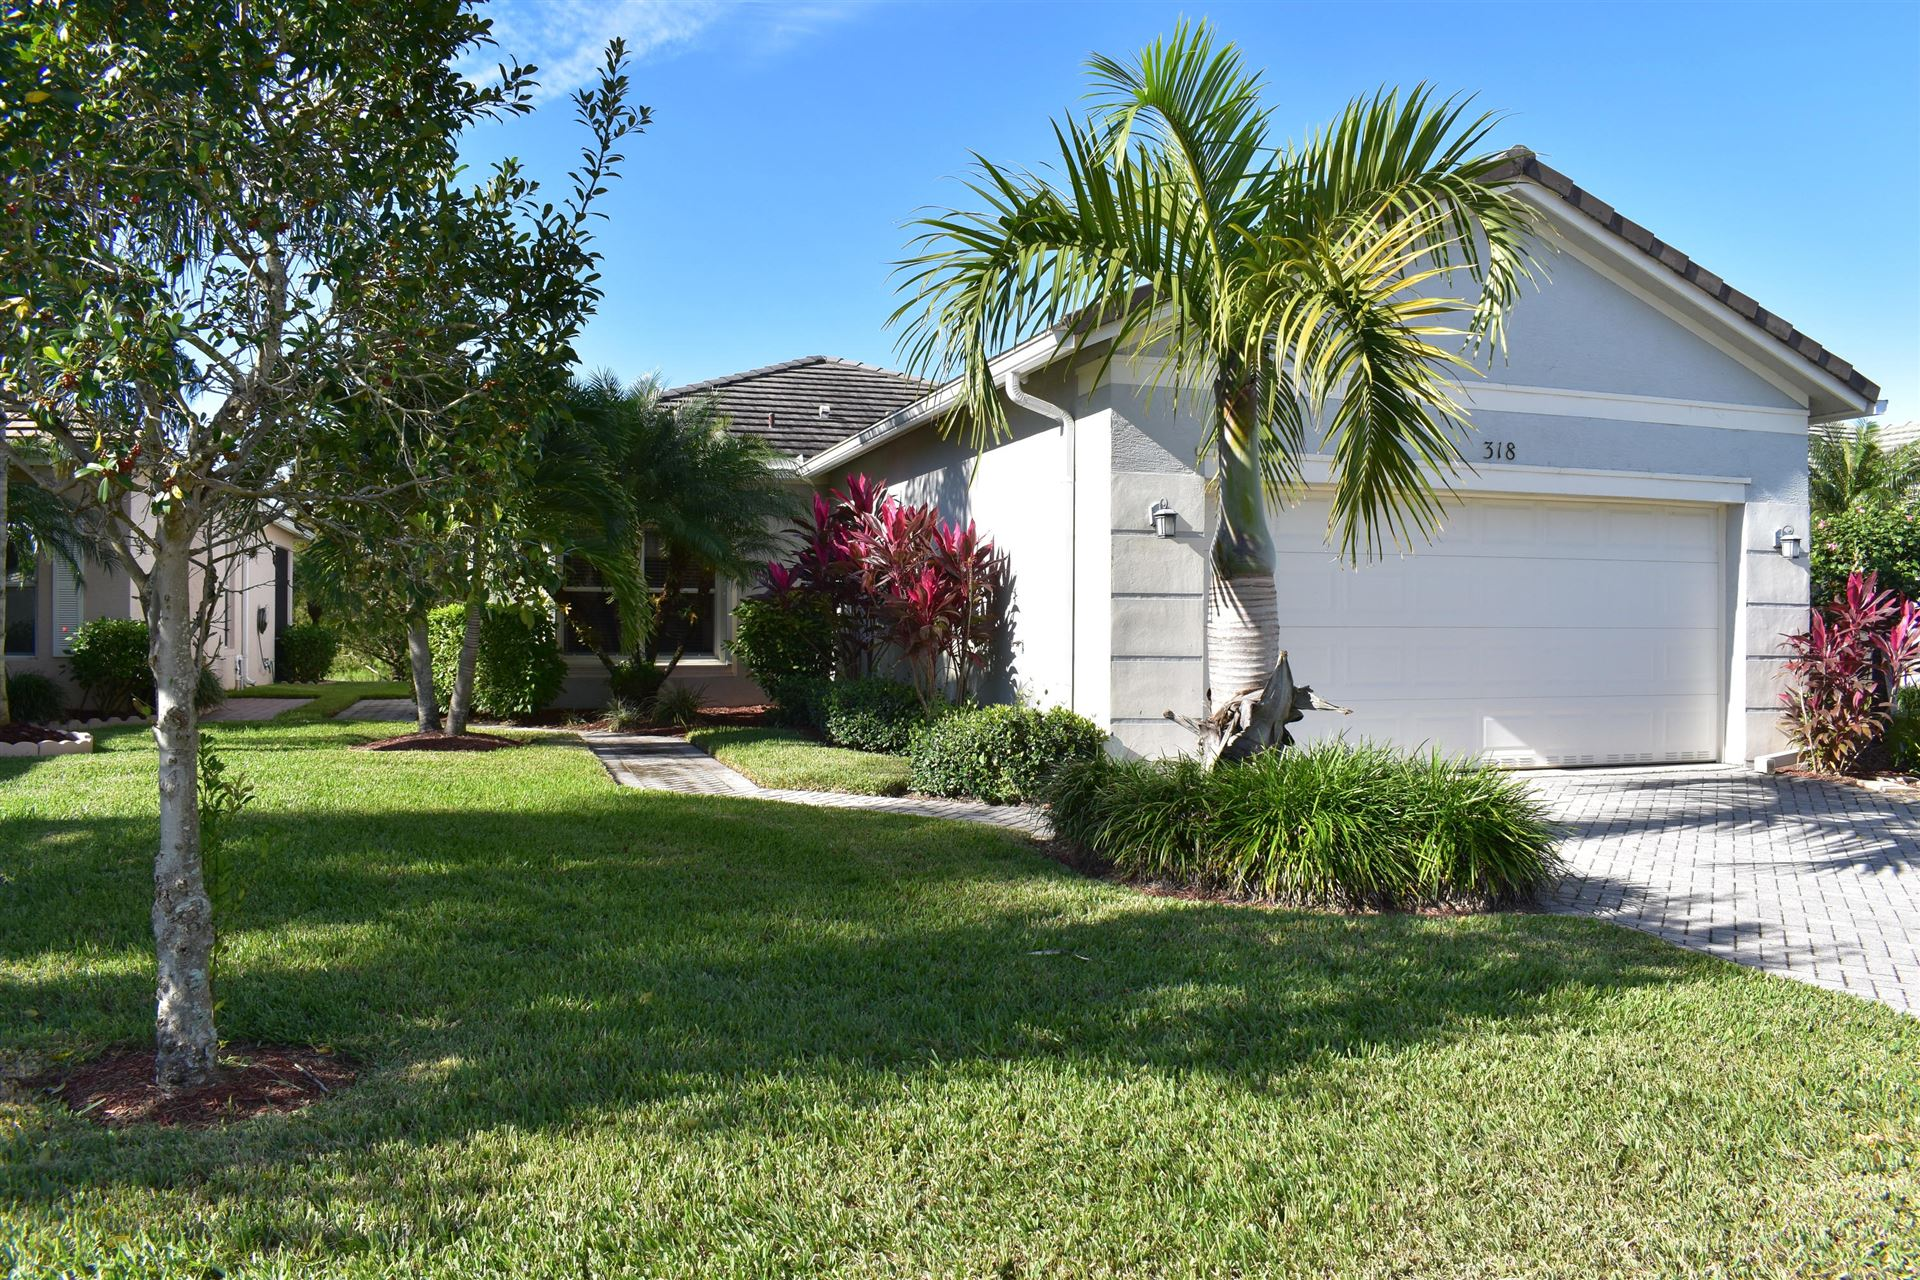 318 SW Tomoka Springs Drive, Port Saint Lucie, FL 34986 - #: RX-10675038